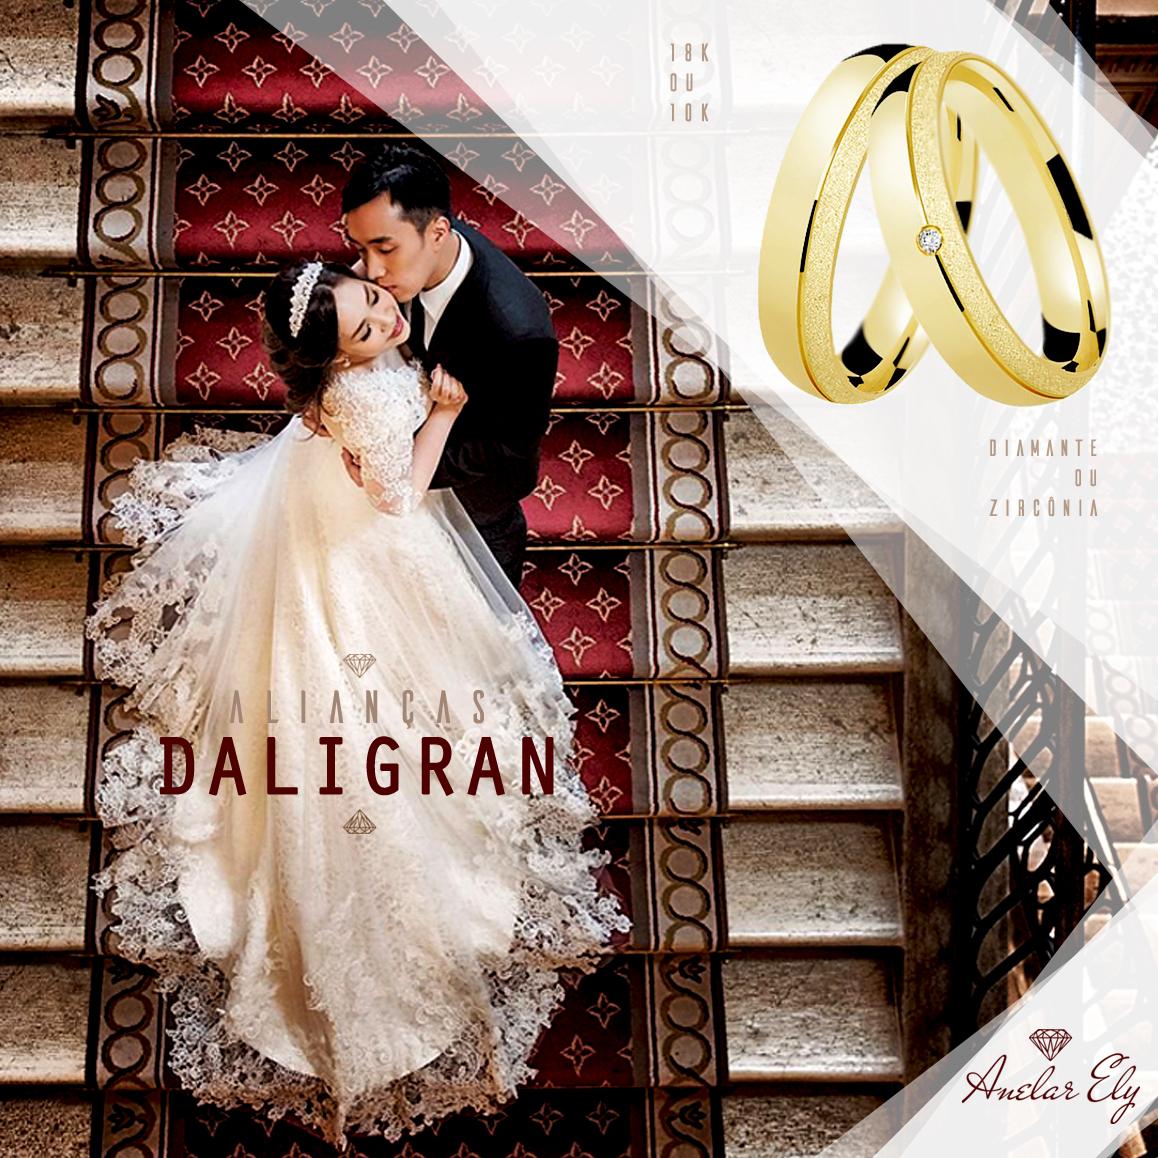 Alianças Daligran